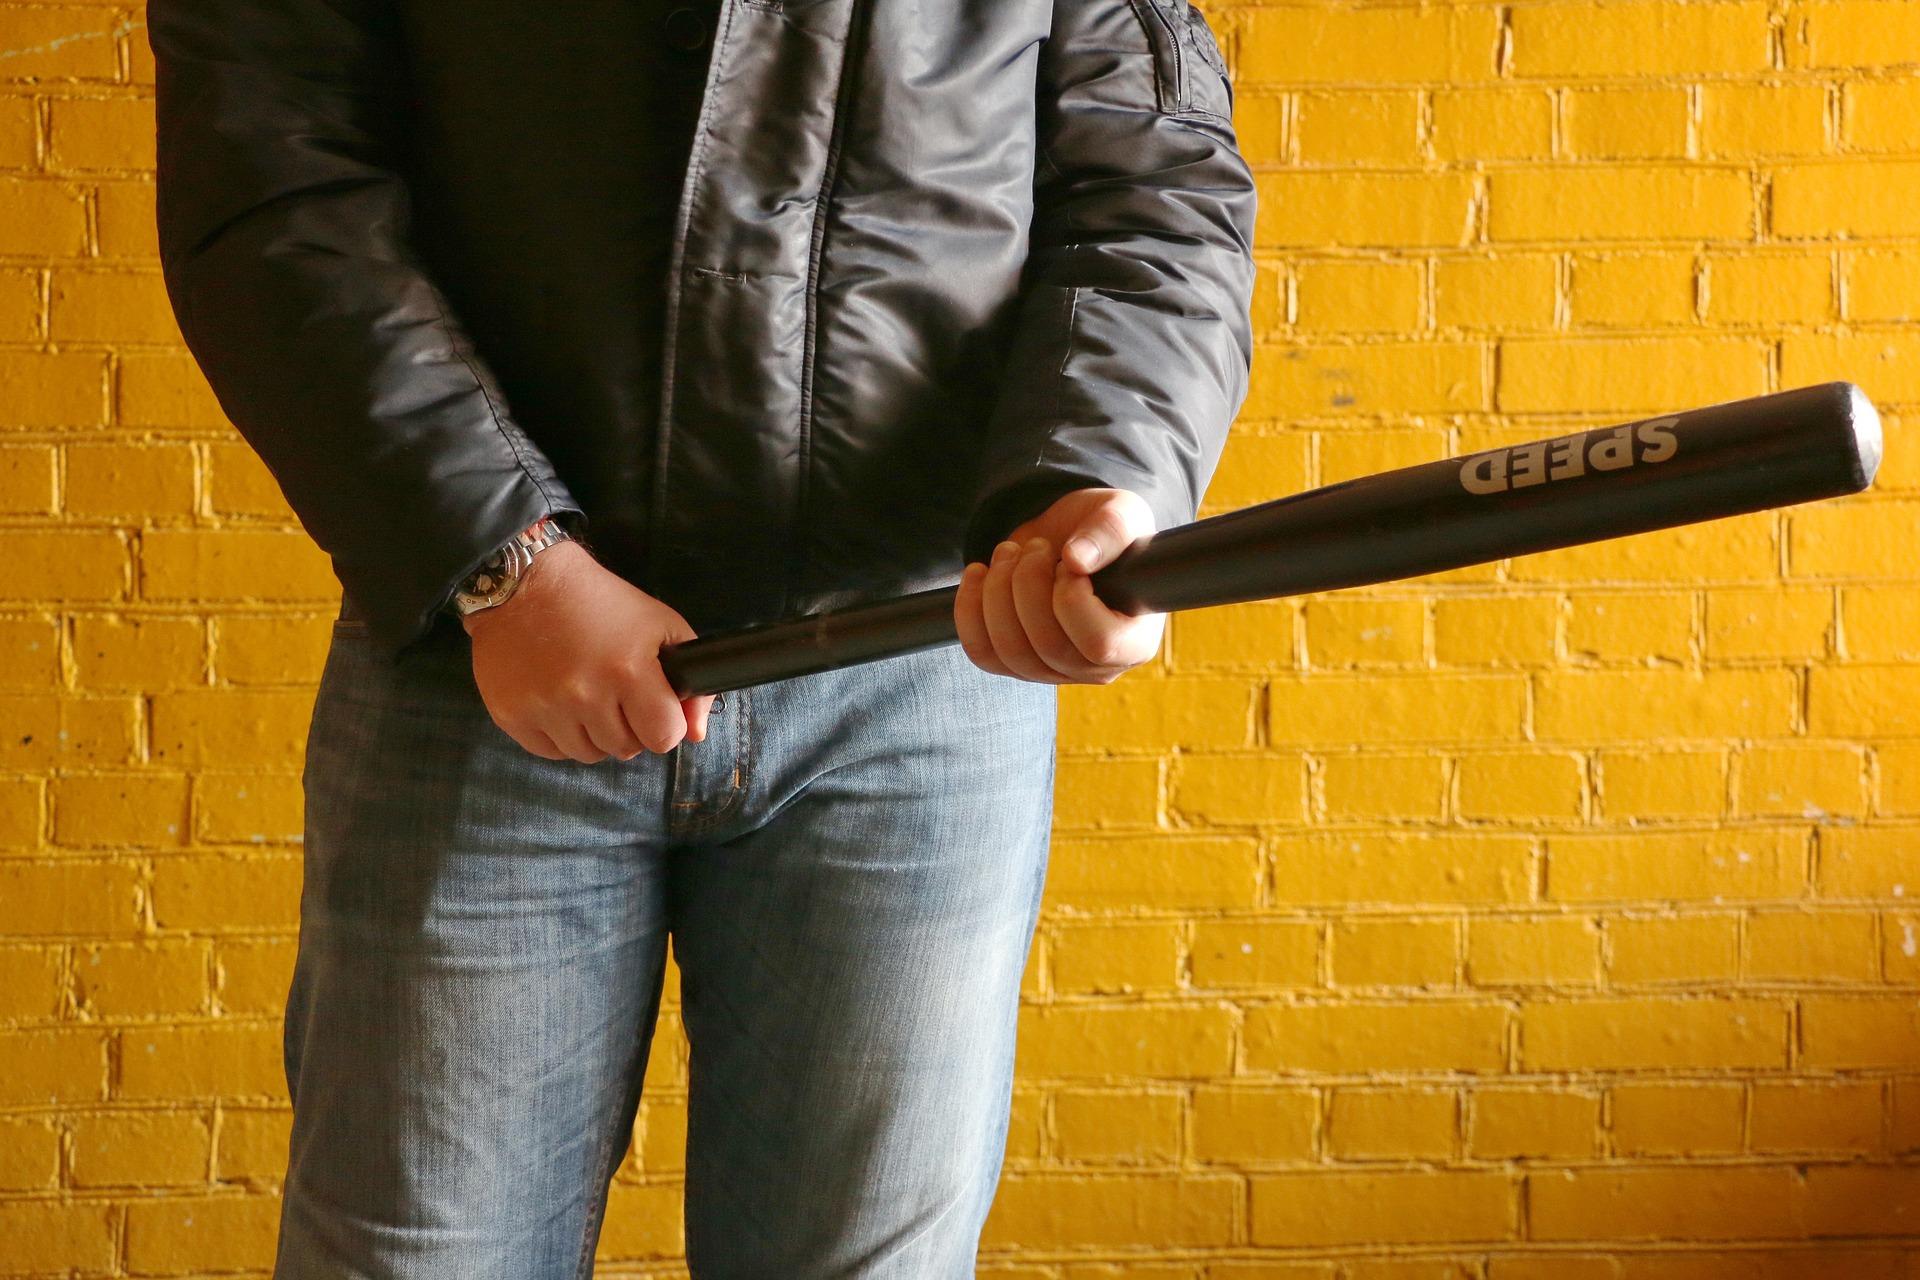 A mugger with a baseball bat